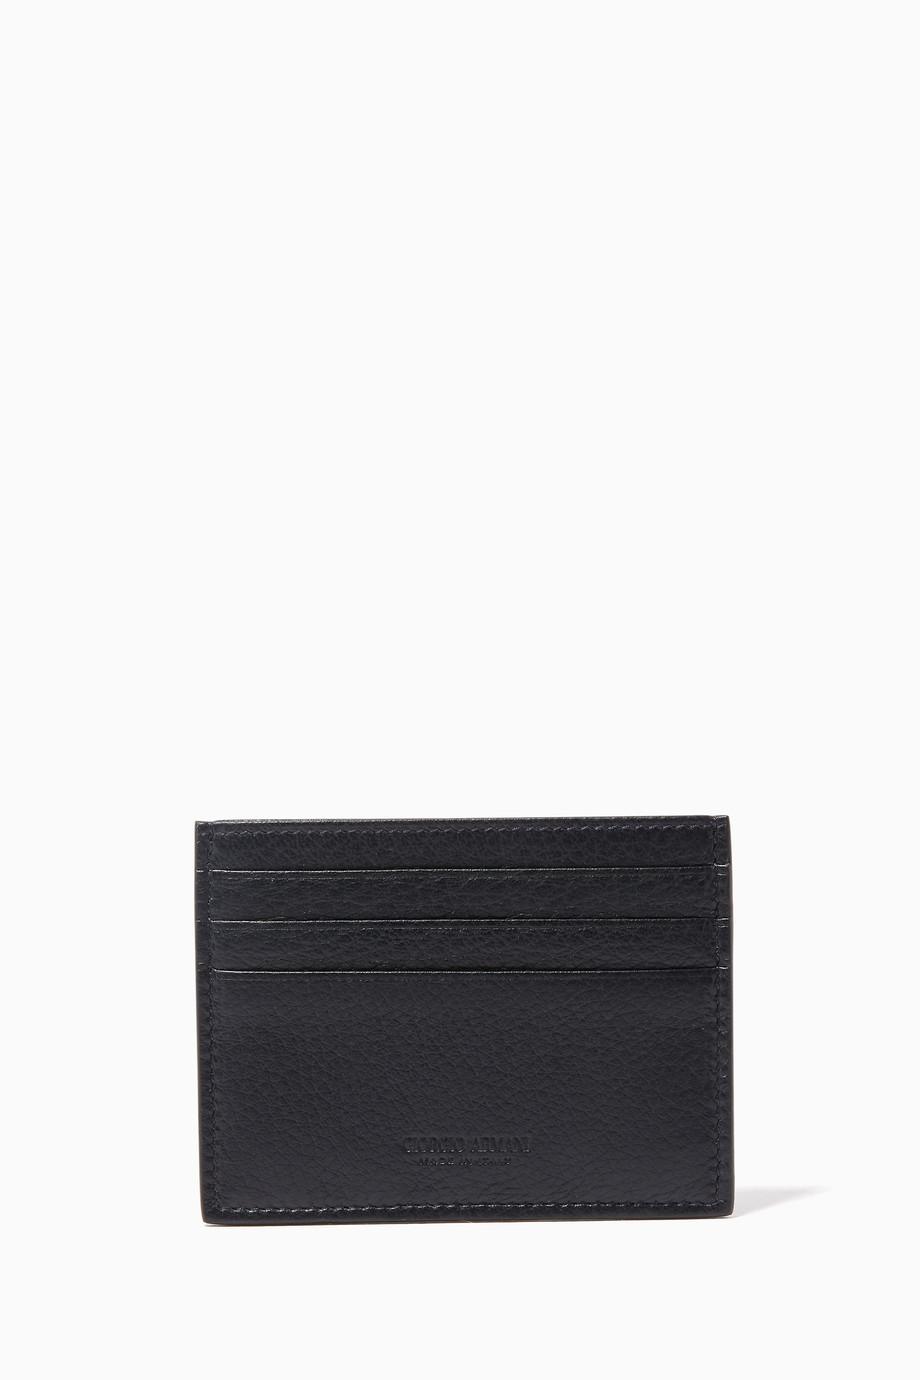 48c788cf95 Shop Armani Beauty Blue Grained-Leather Cardholder for Men | Ounass UAE